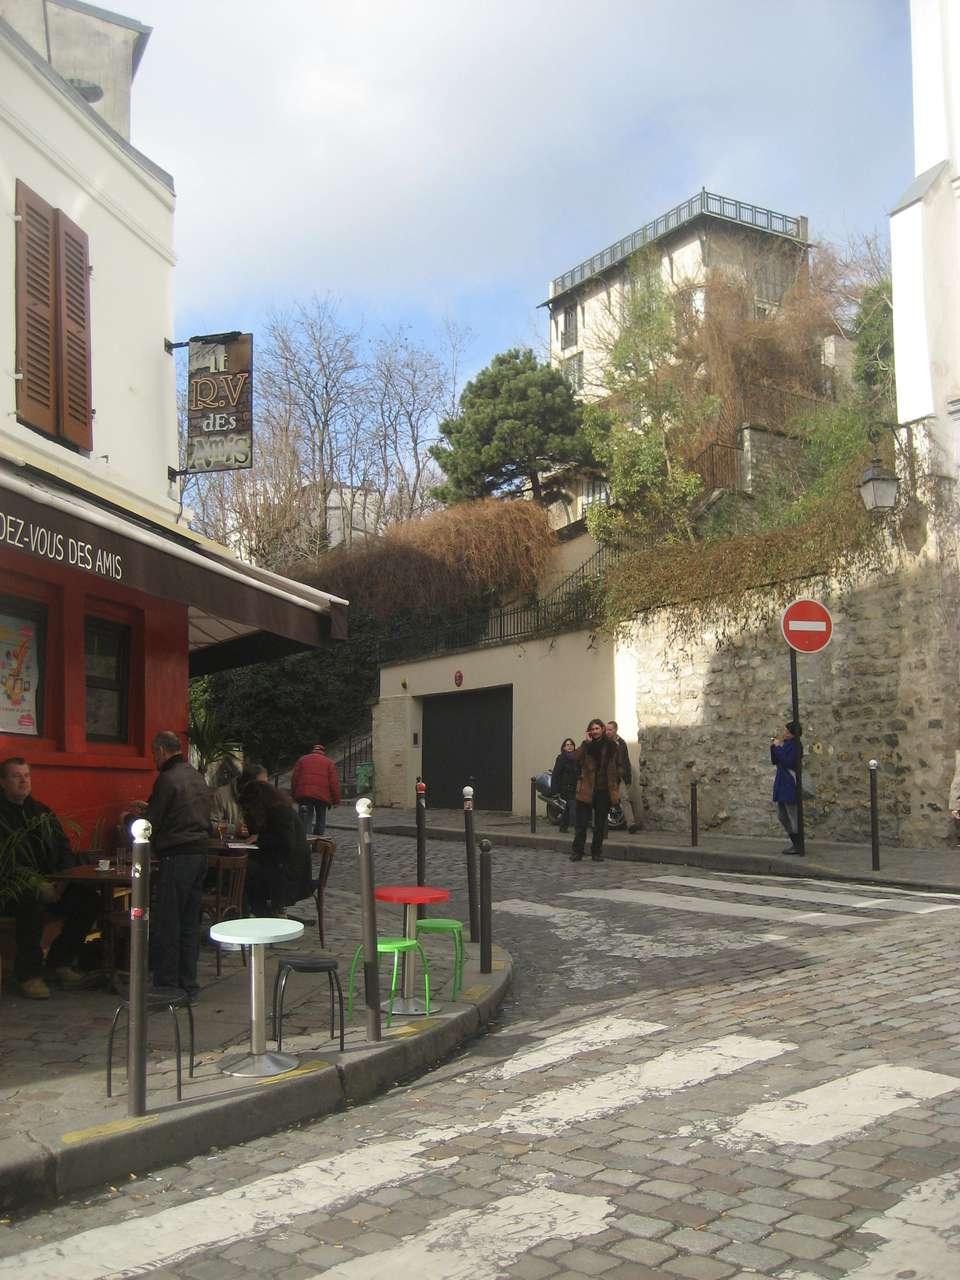 Montmartre Neighborhood Photo Gallery